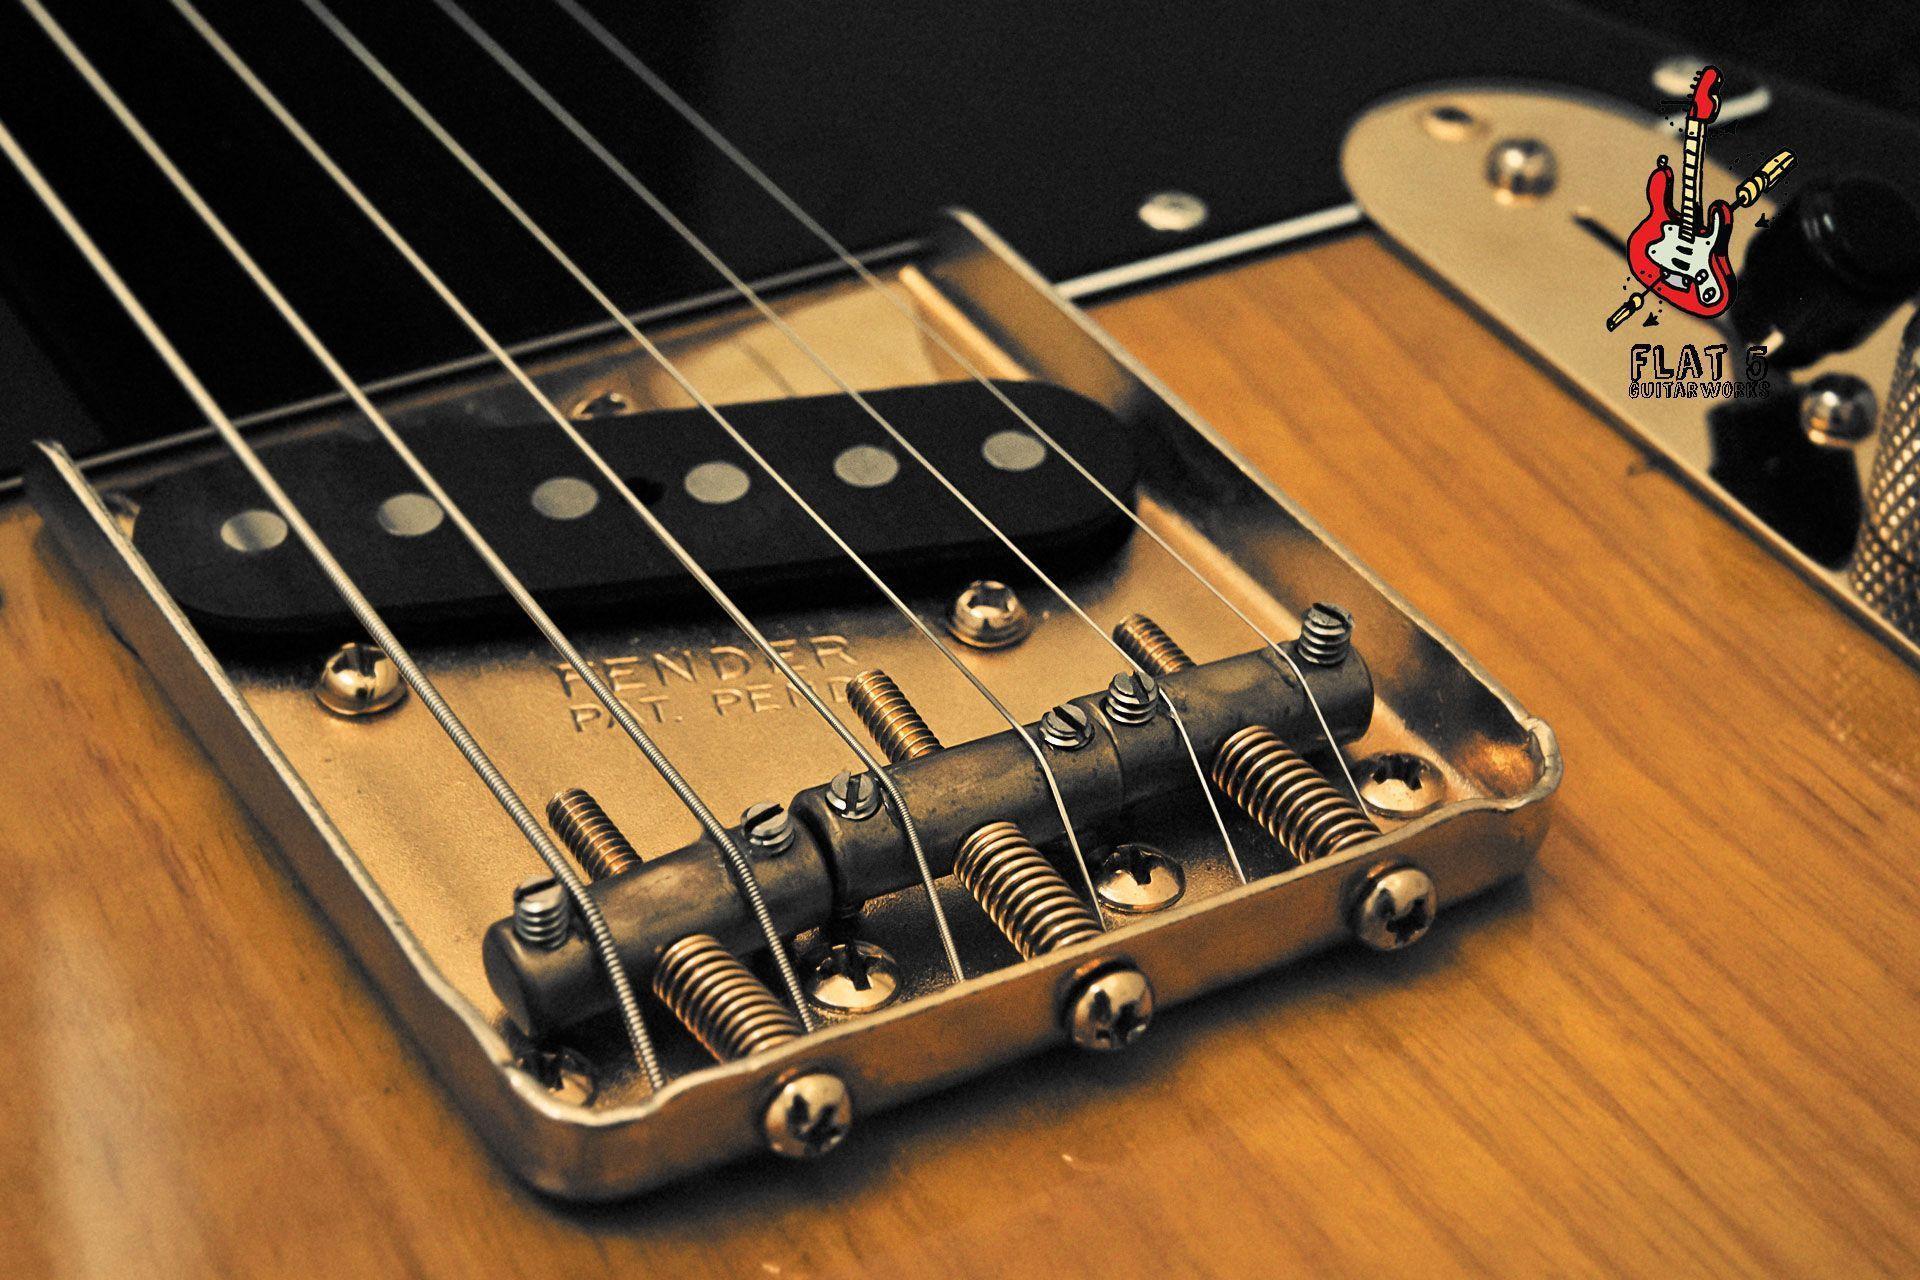 Fender Telecaster Wallpapers 1920x1280